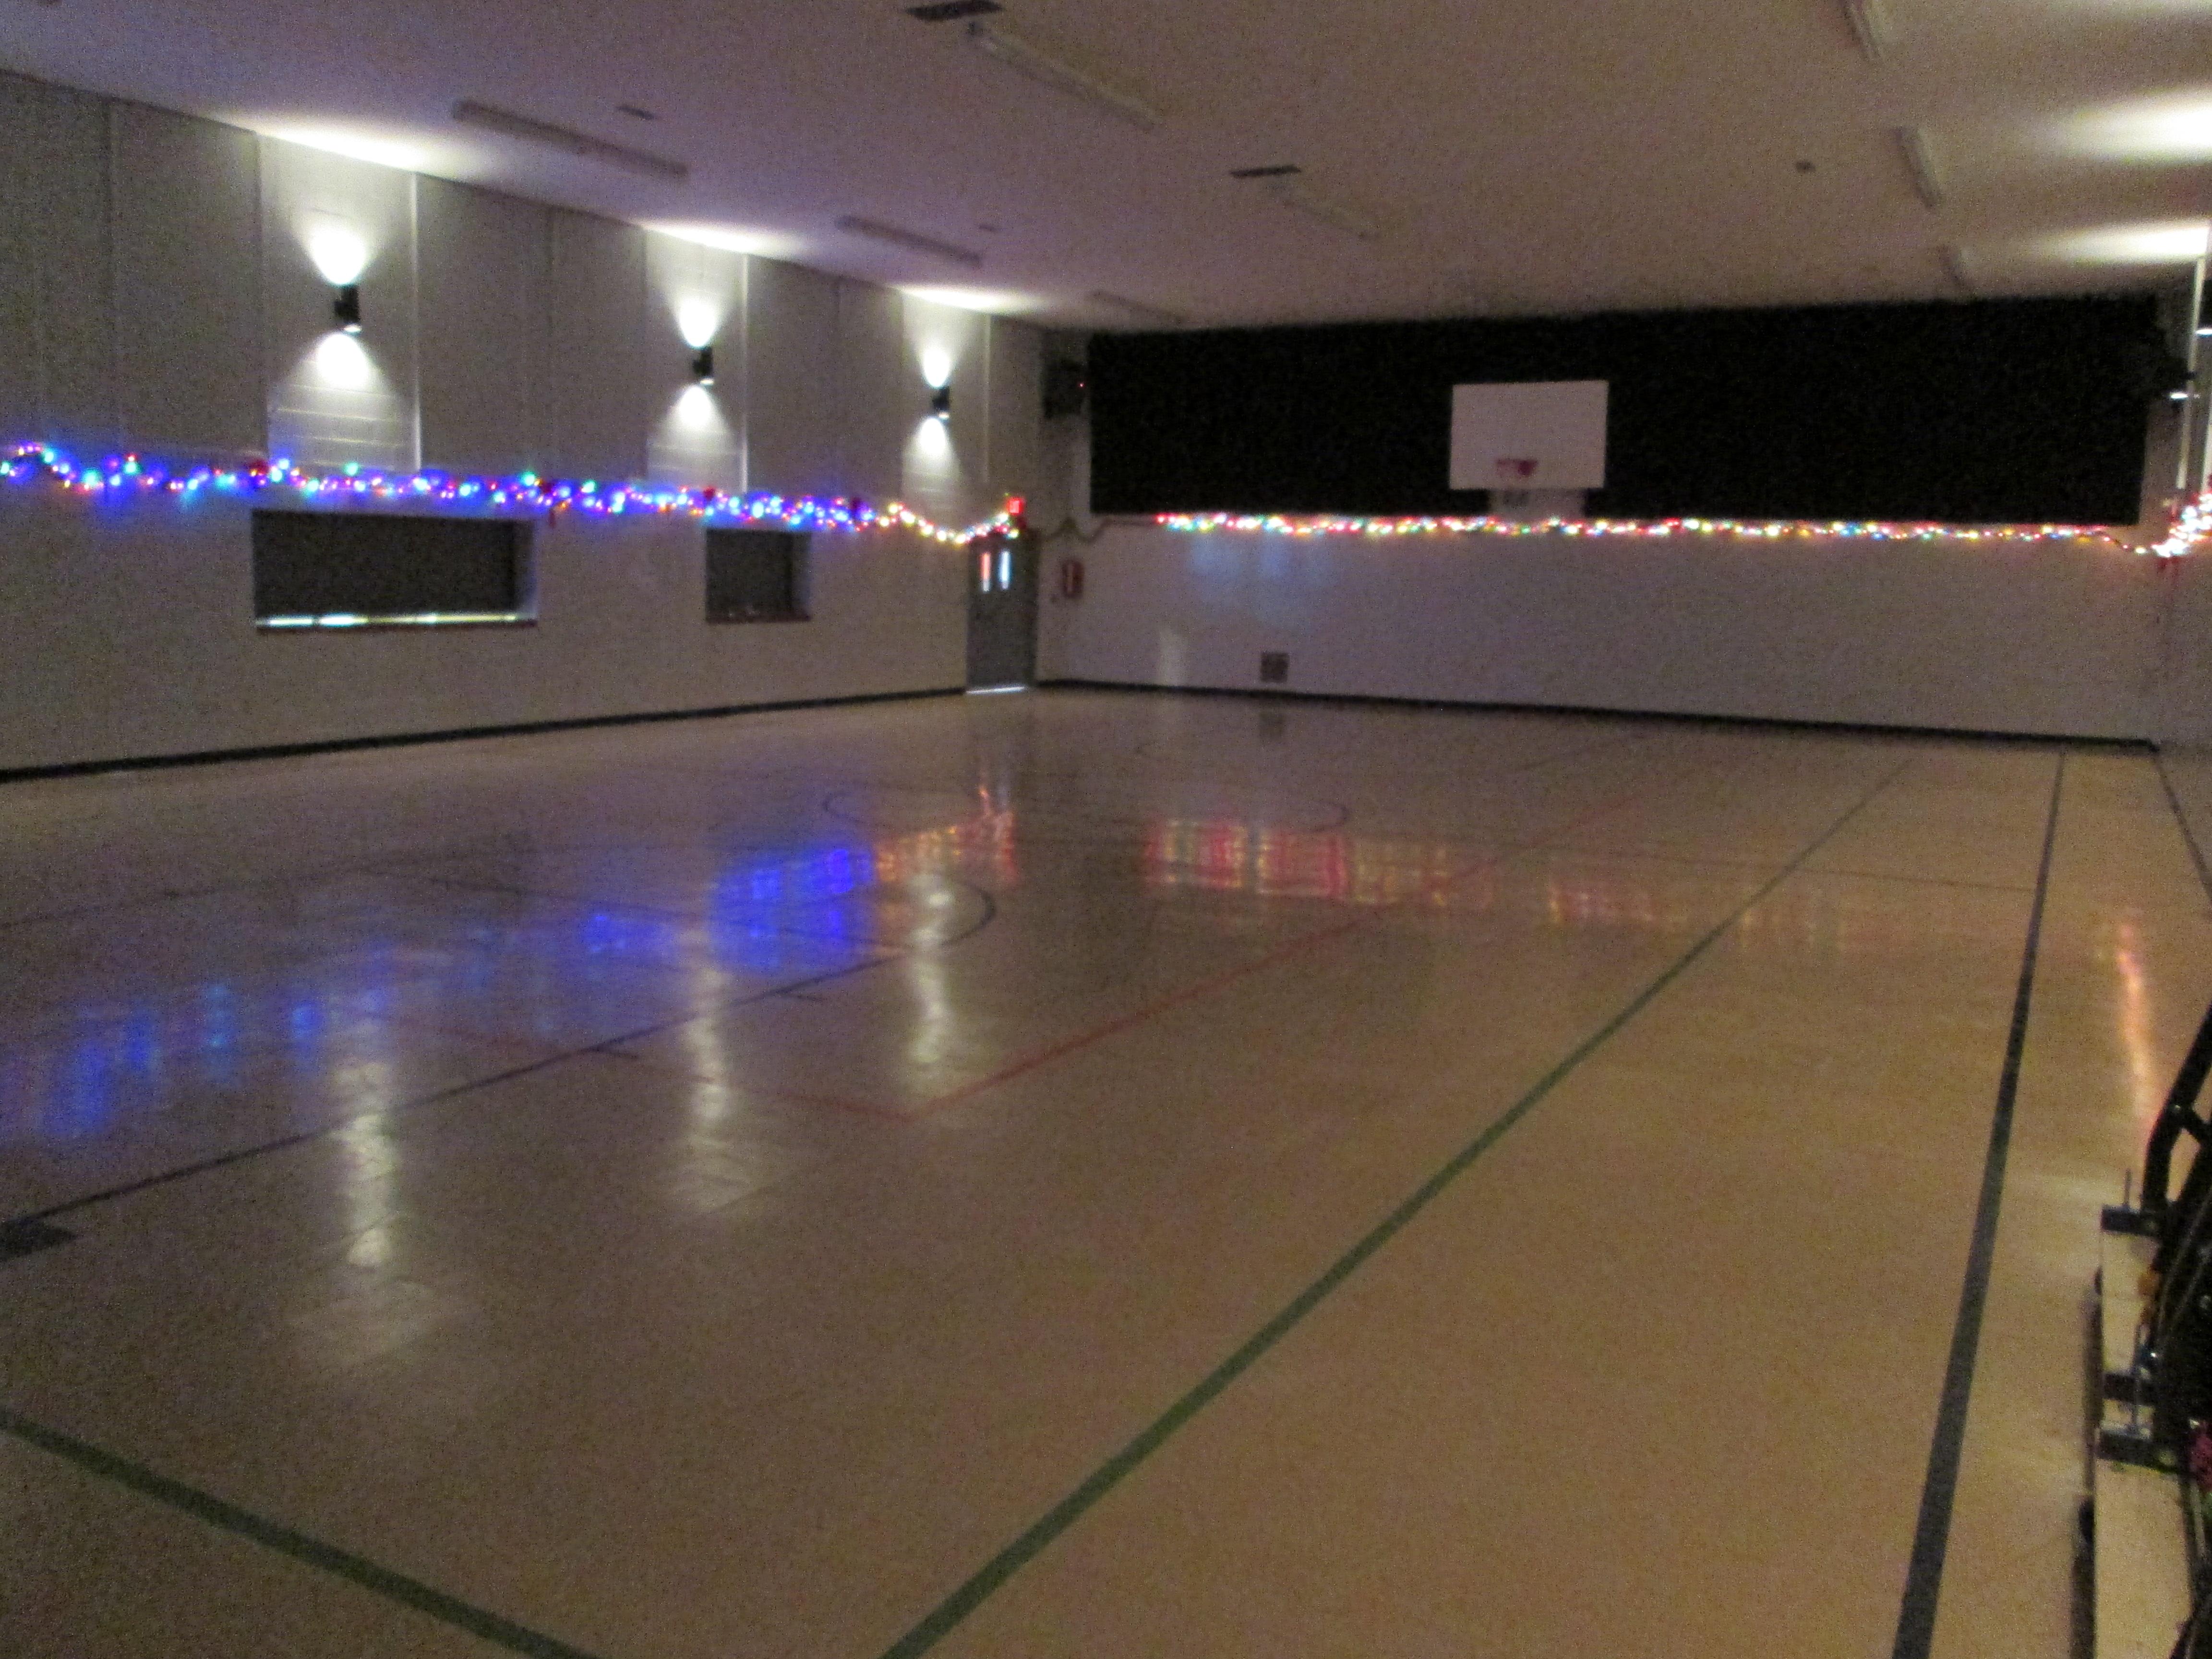 Gymnasium Dimmed Lights